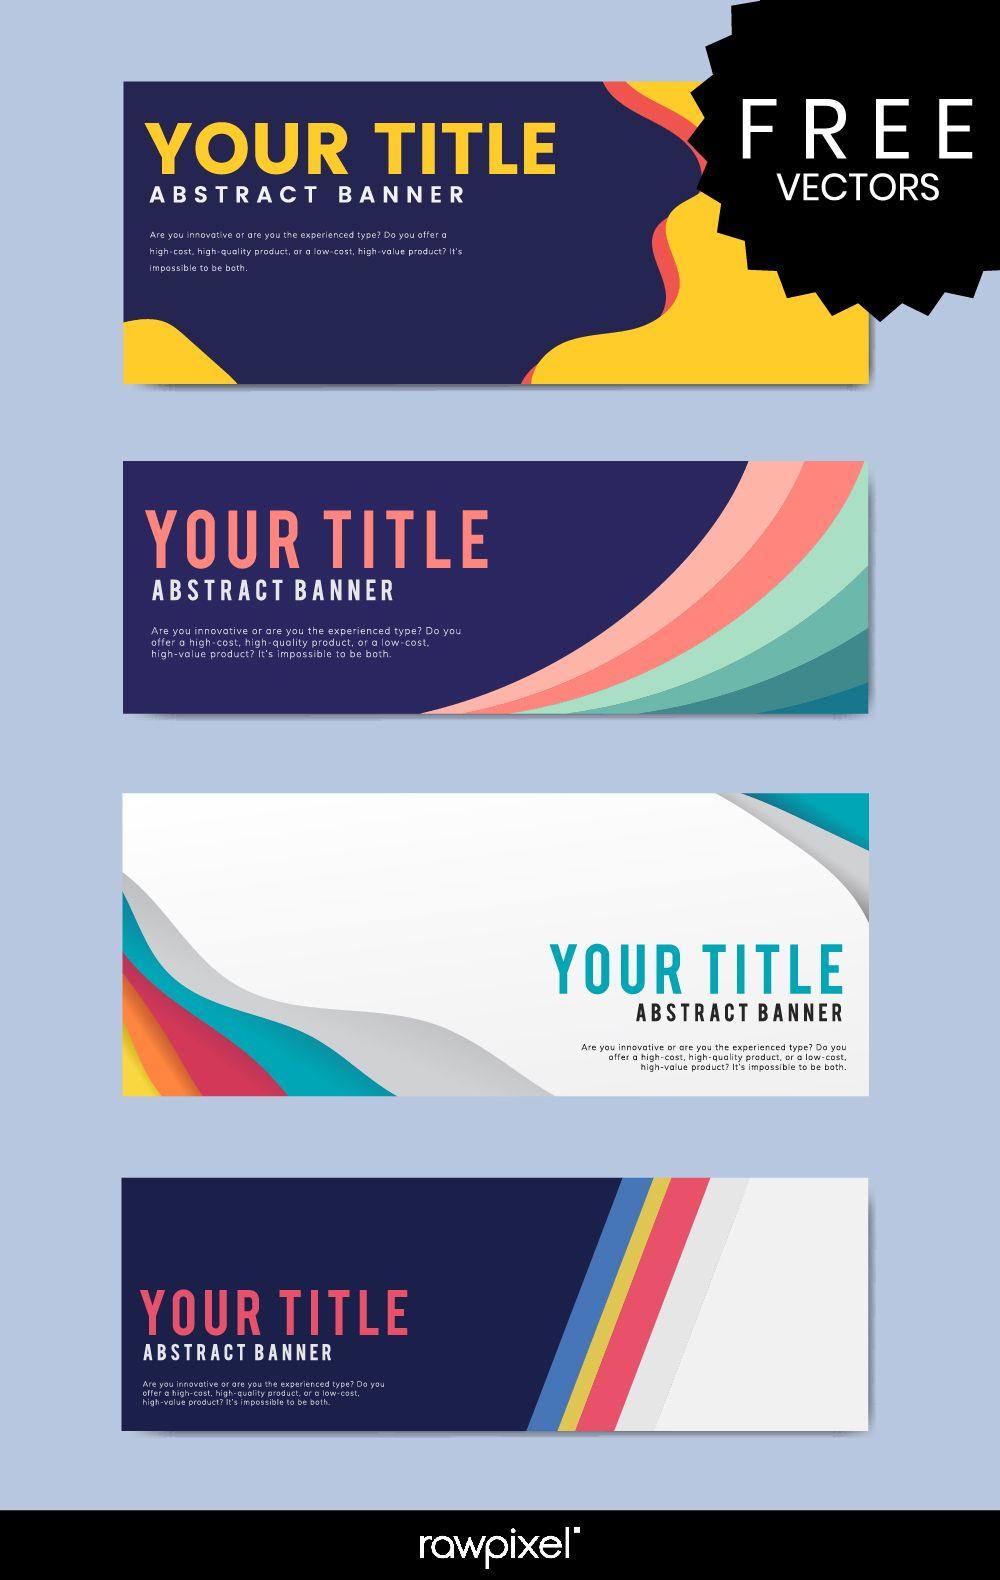 Download Free Modern Business Banner Templates At Rawpixel Com Banner Design Inspiration Business Banner Banner Template Design